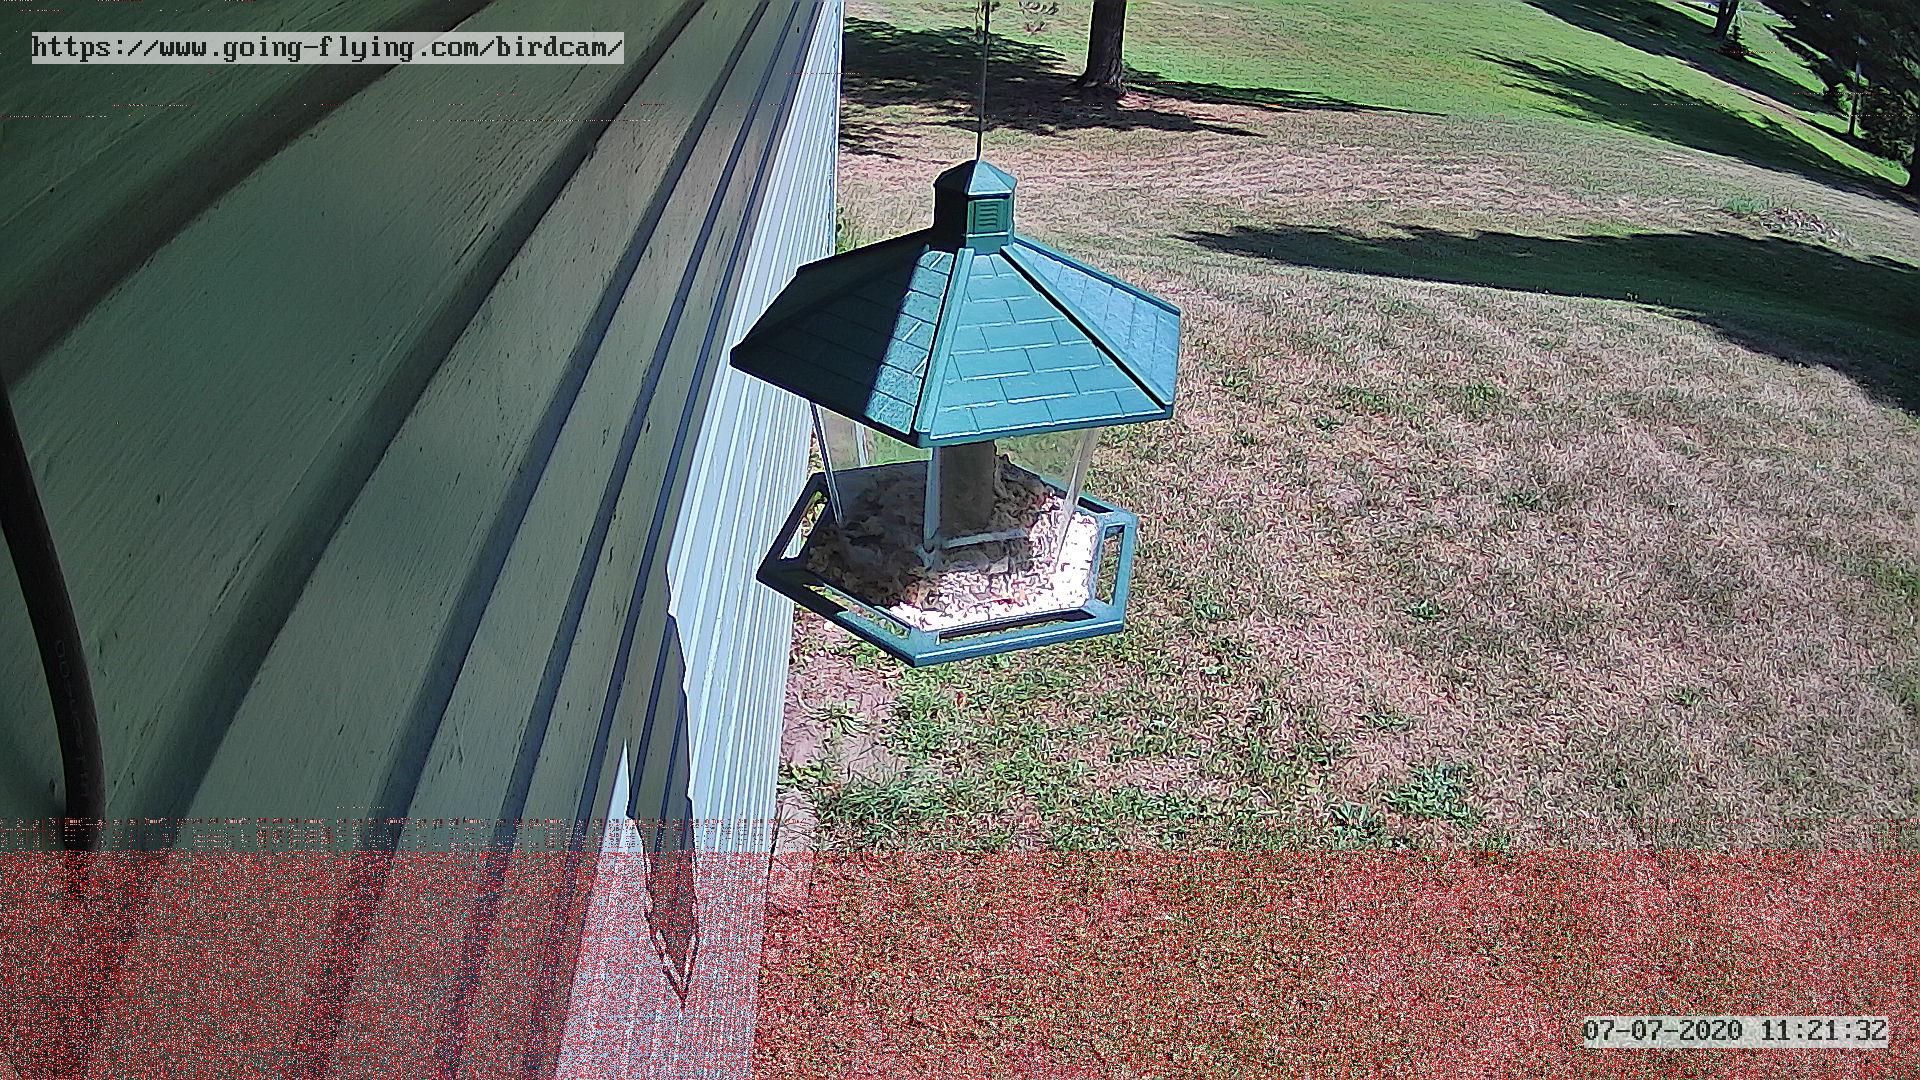 Birdcam frame grab